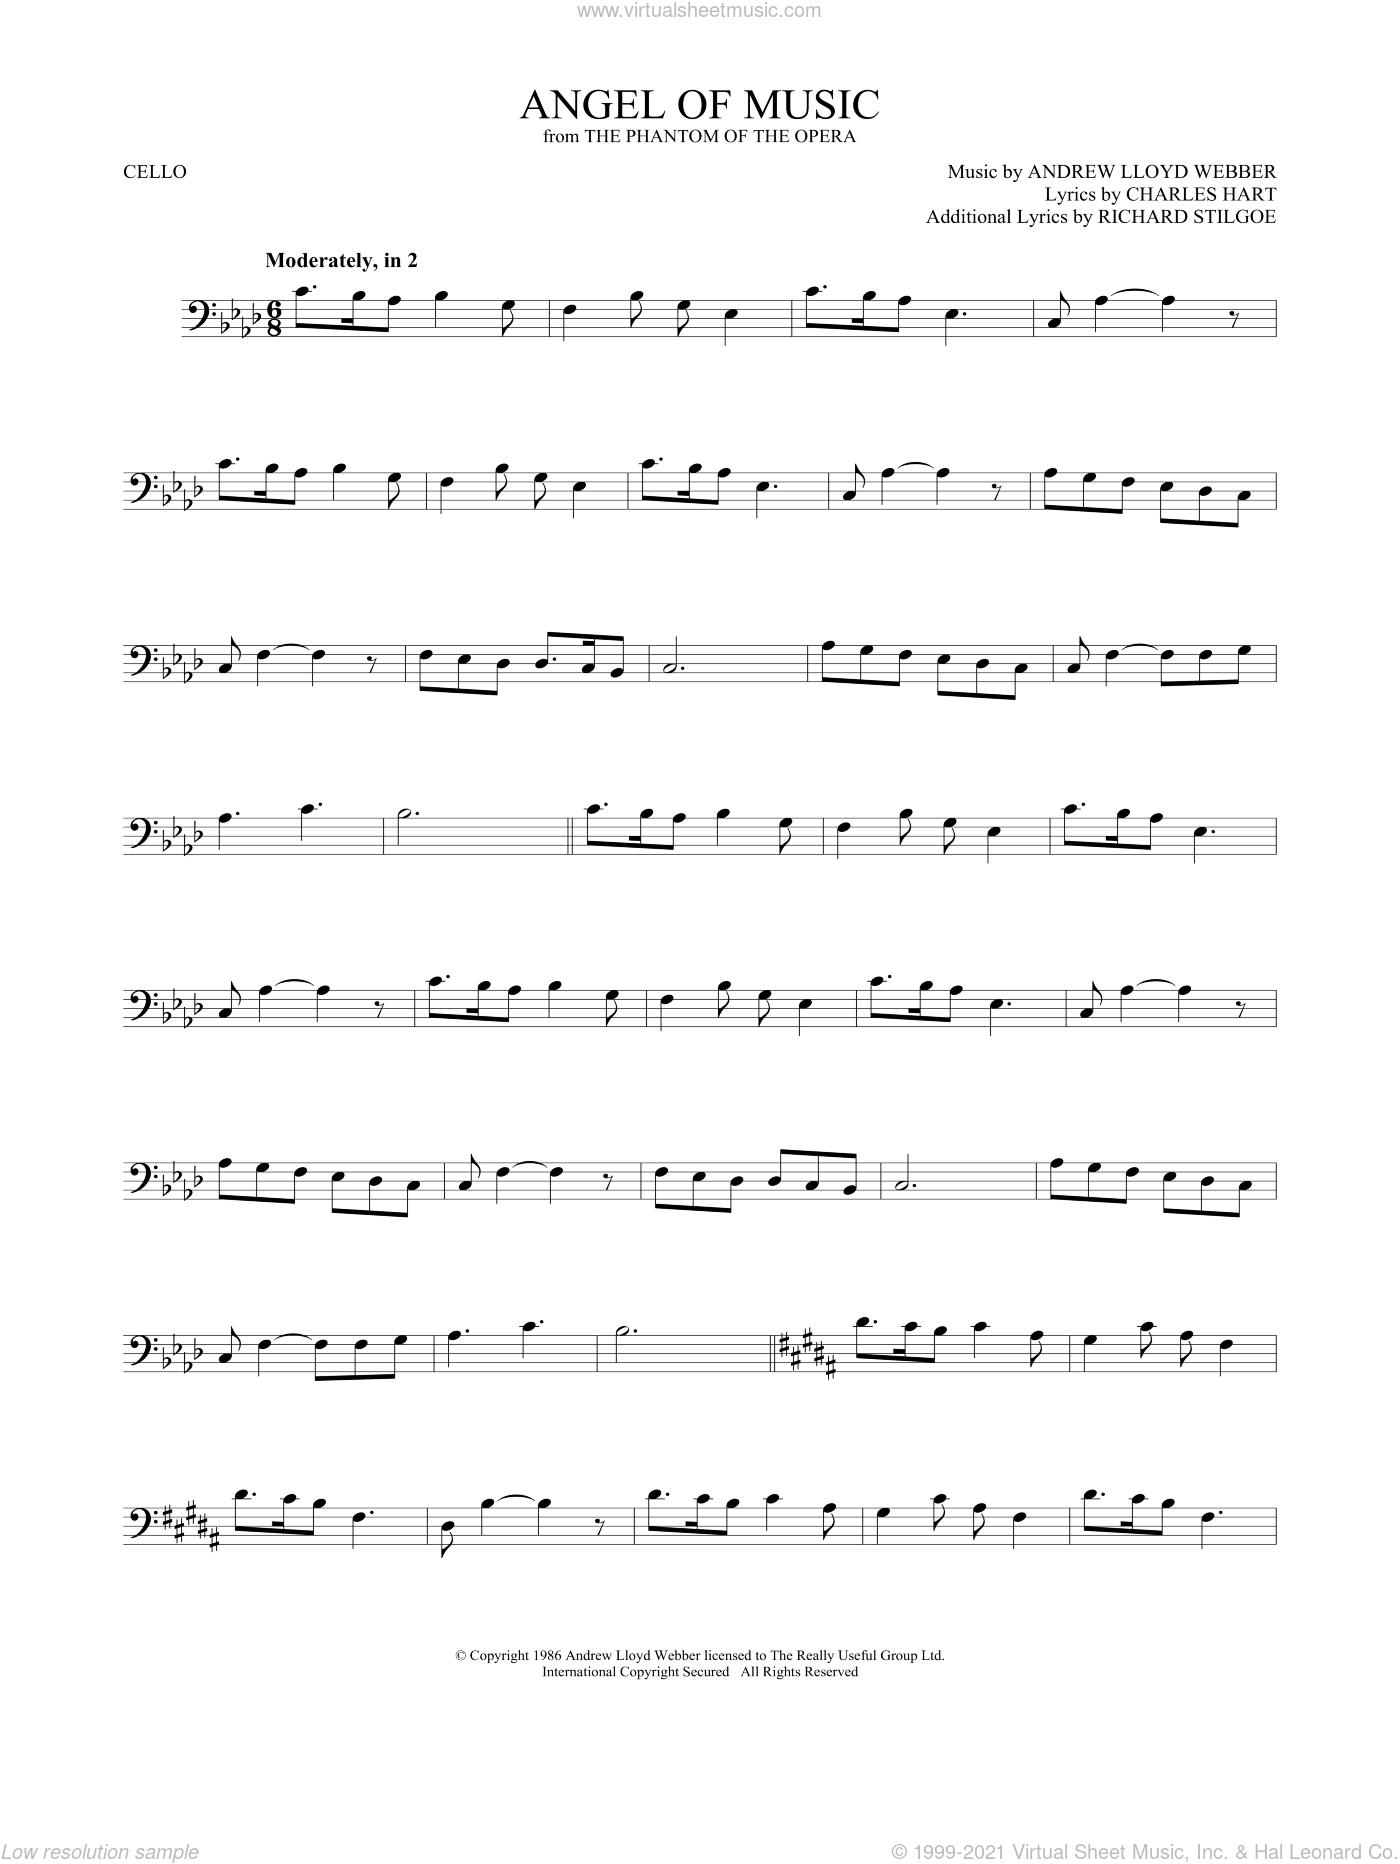 Angel Of Music (from The Phantom Of The Opera) sheet music for cello solo by Andrew Lloyd Webber, Charles Hart and Richard Stilgoe, intermediate skill level